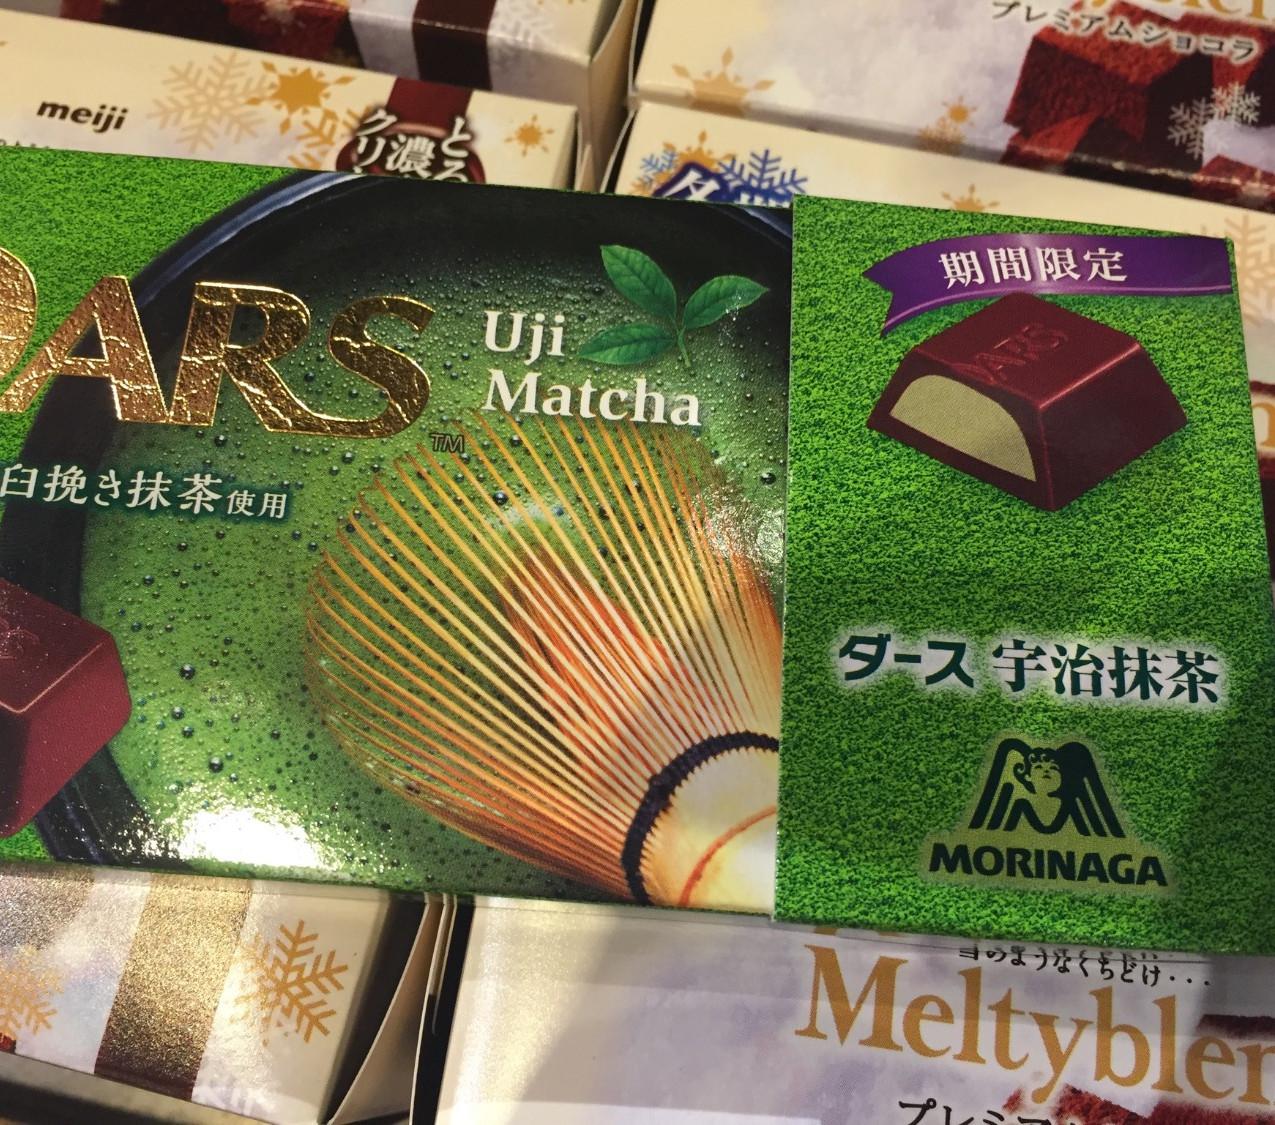 Matcha (green tea powder) flavors these chocolate treats from Japan. Interesting.